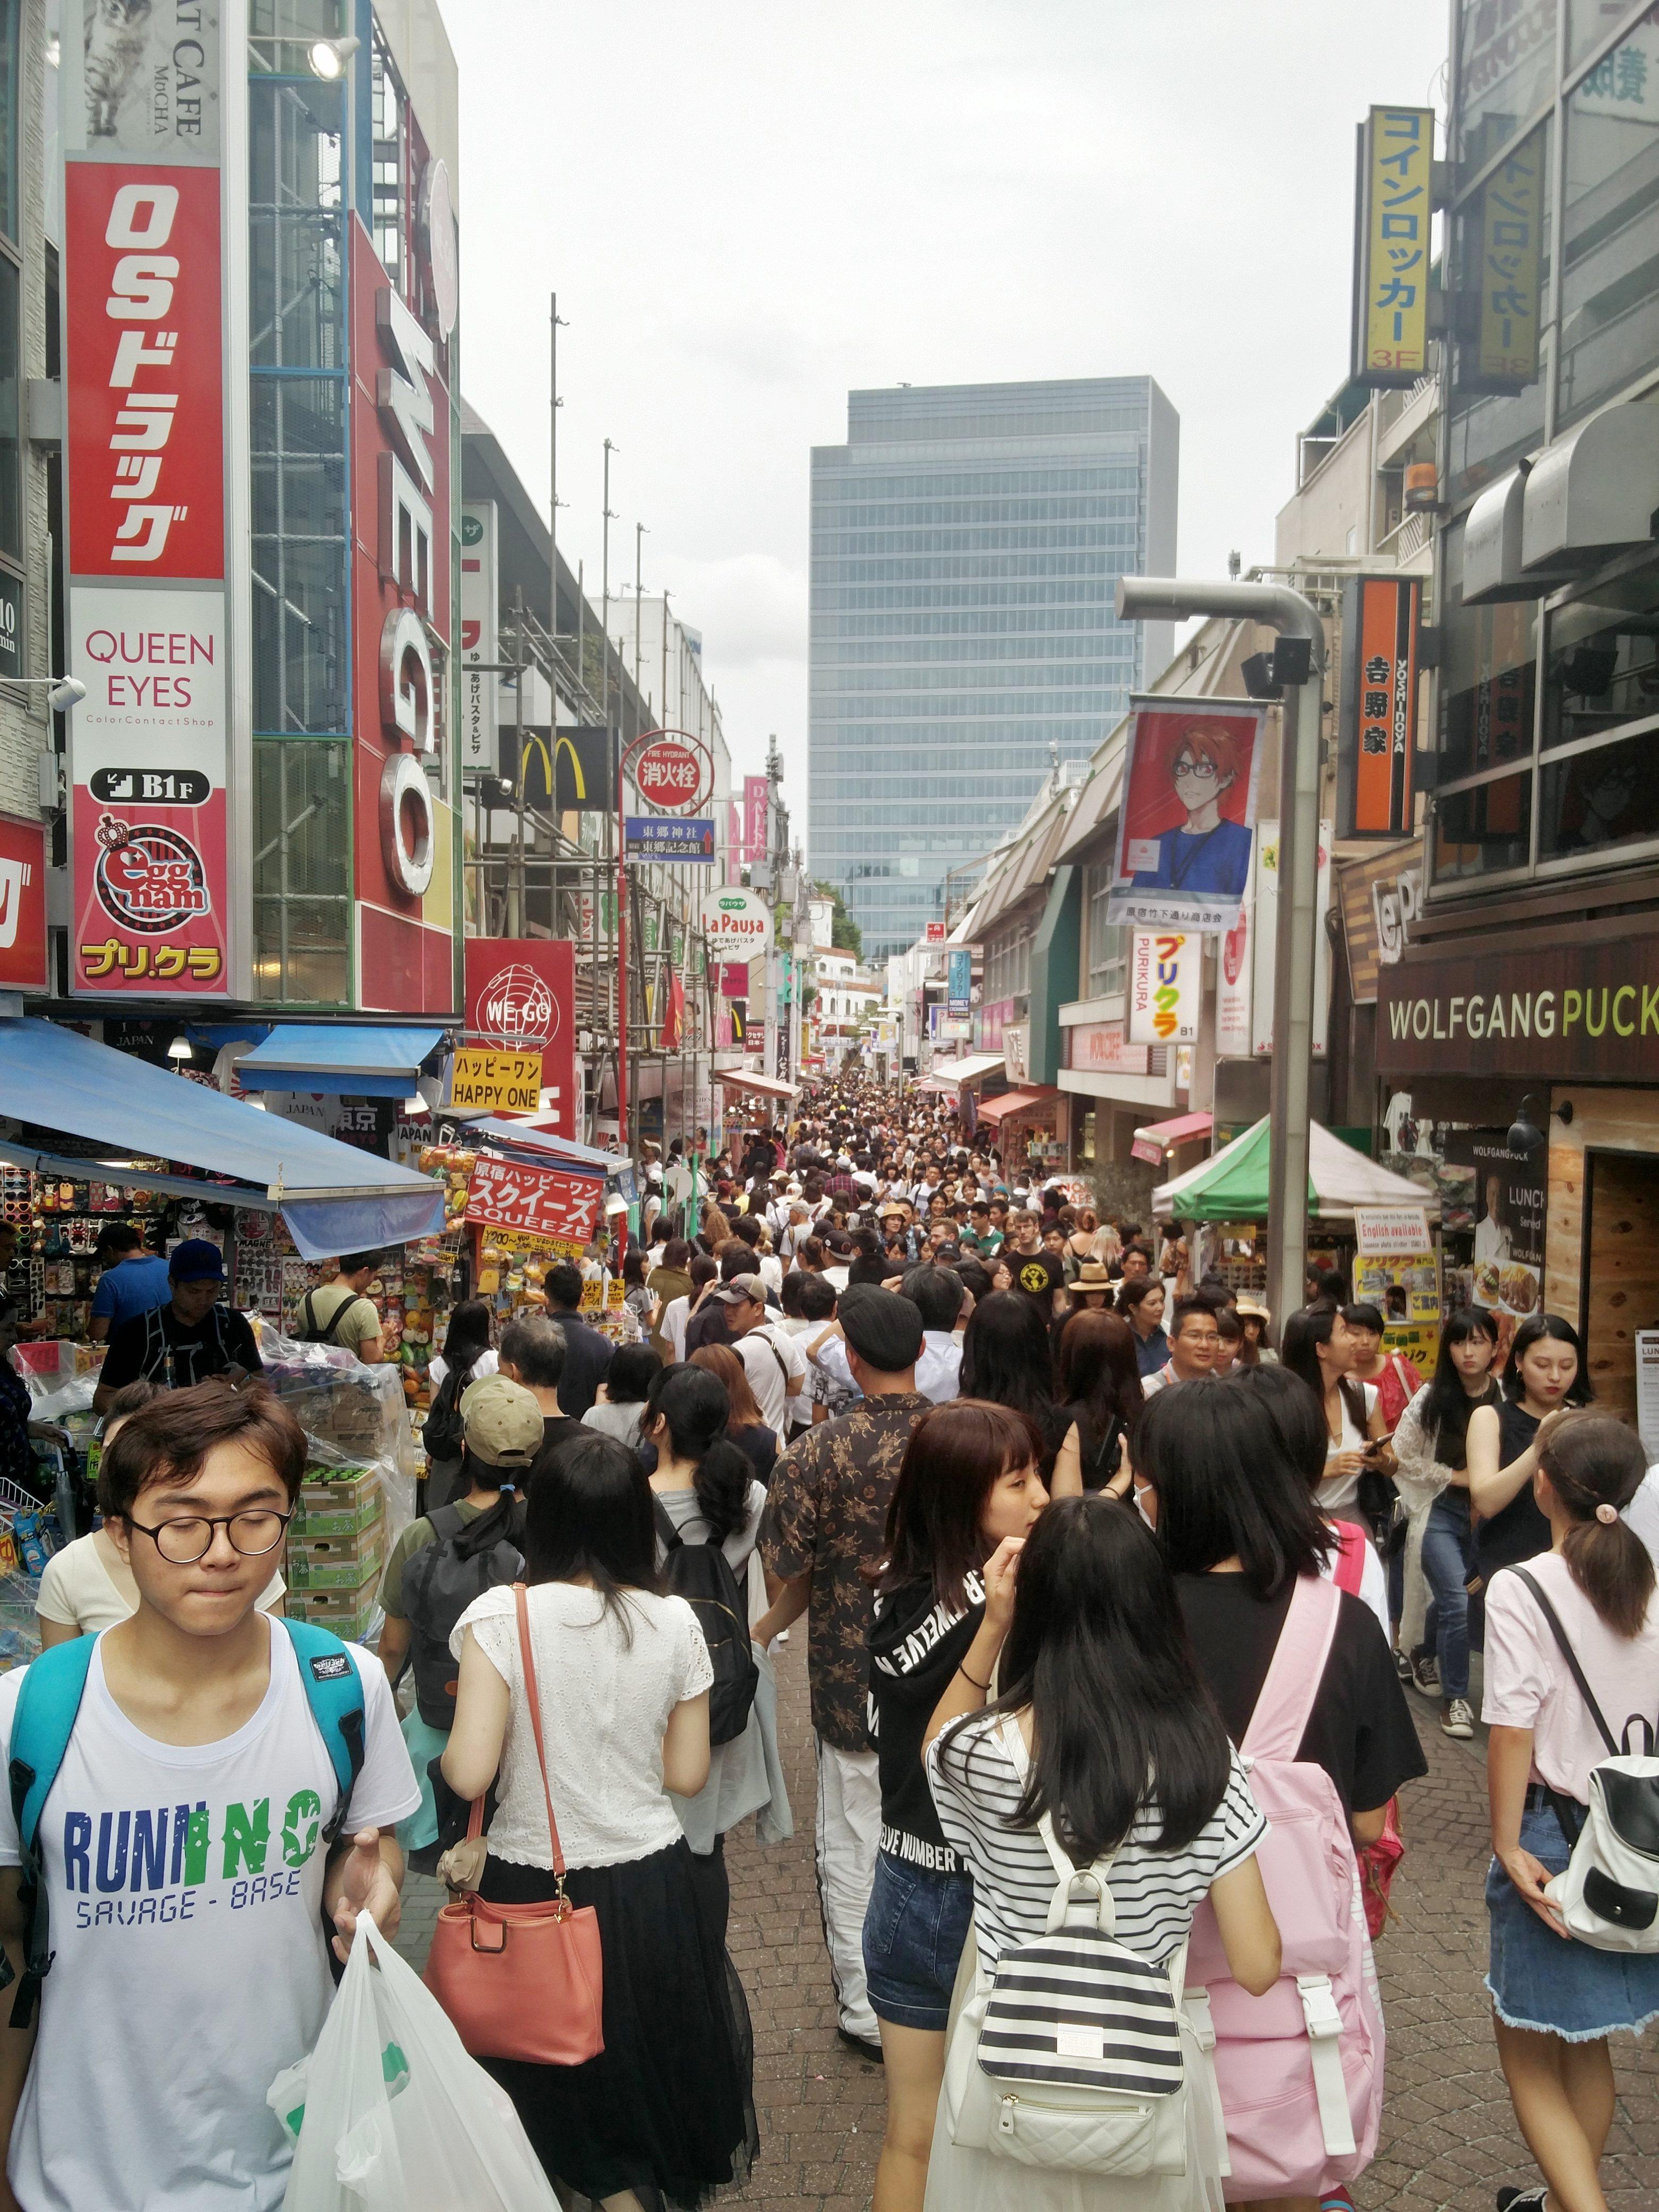 Scenes from Japan / Takeshita Street Market (Photo: Sastry Bhamidi)